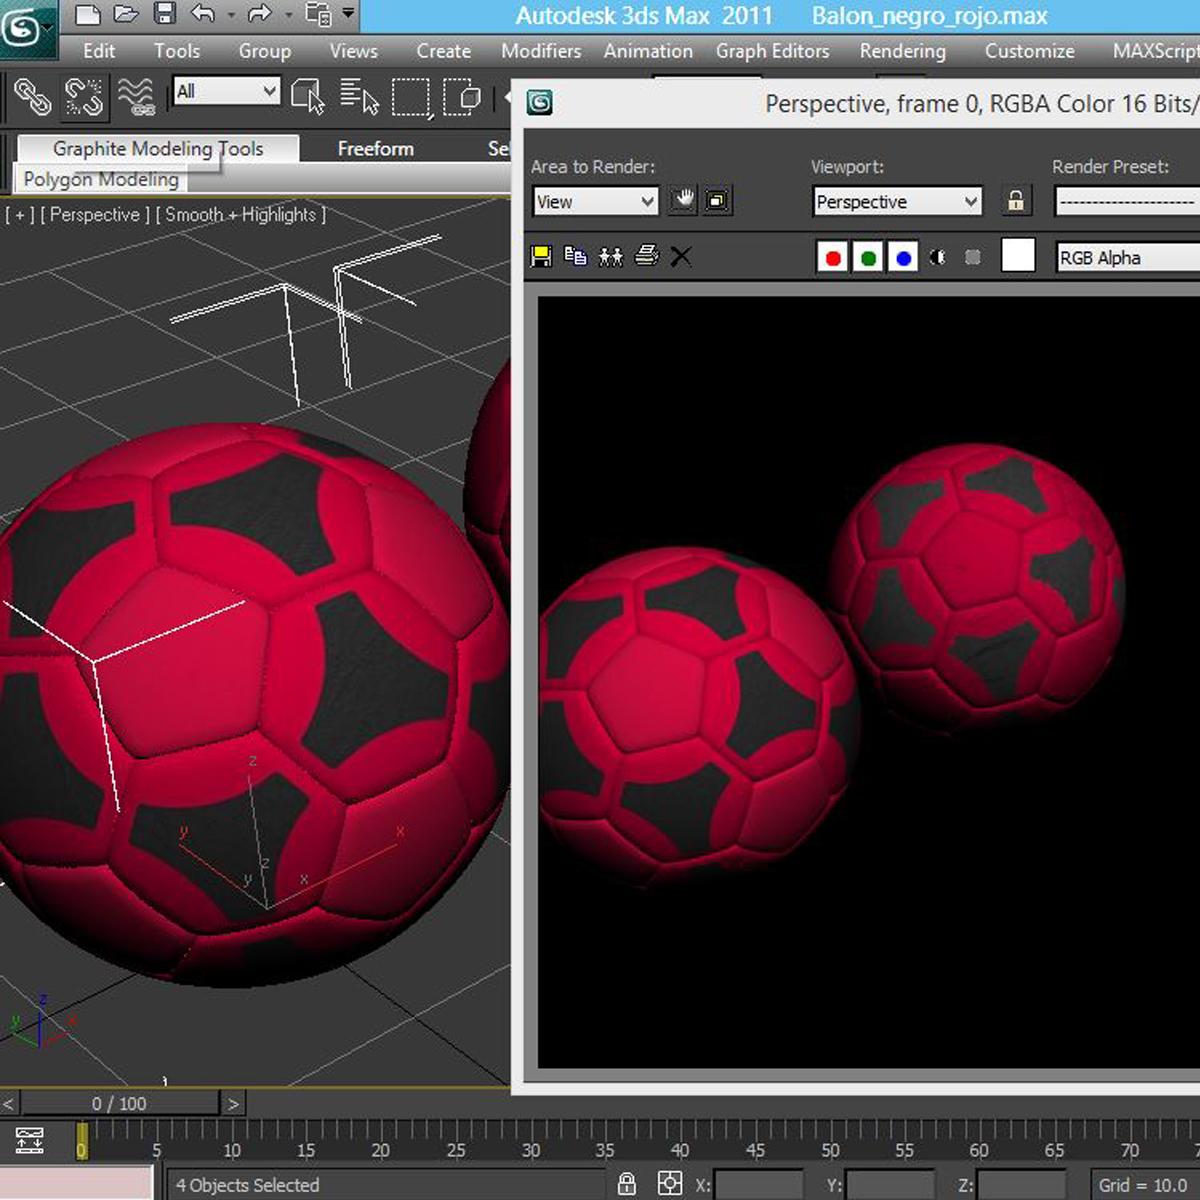 soccerball red black 3d model 3ds max fbx c4d ma mb obj 204559